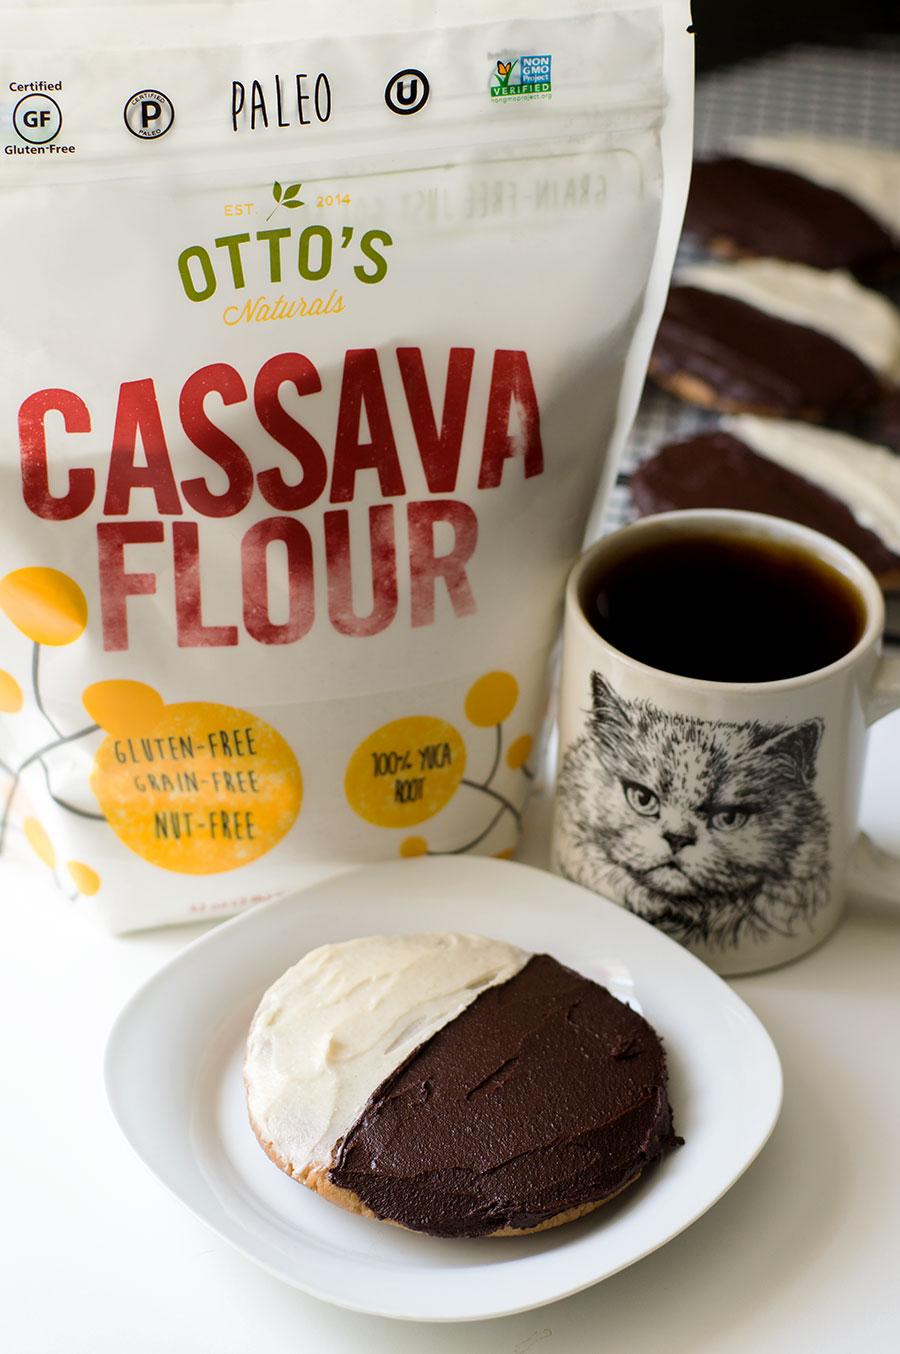 otto's cassava flour black and white cookies (Paleo, AIP, vegan)